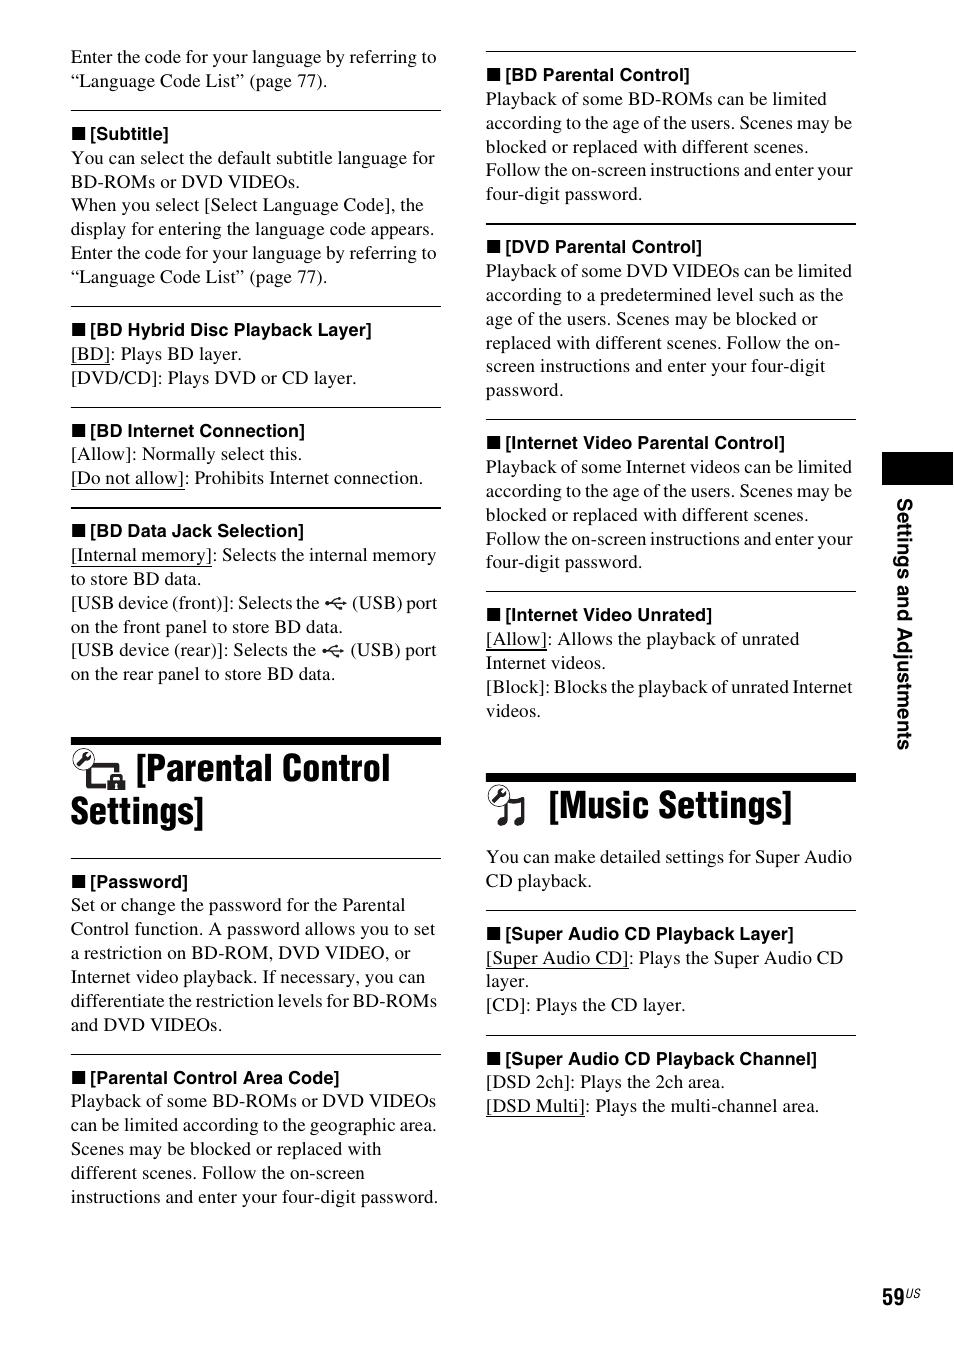 parental control settings music settings parental control settings rh manualsdir com Sony BDV- E570 Sony BDV- N8100W 5 1